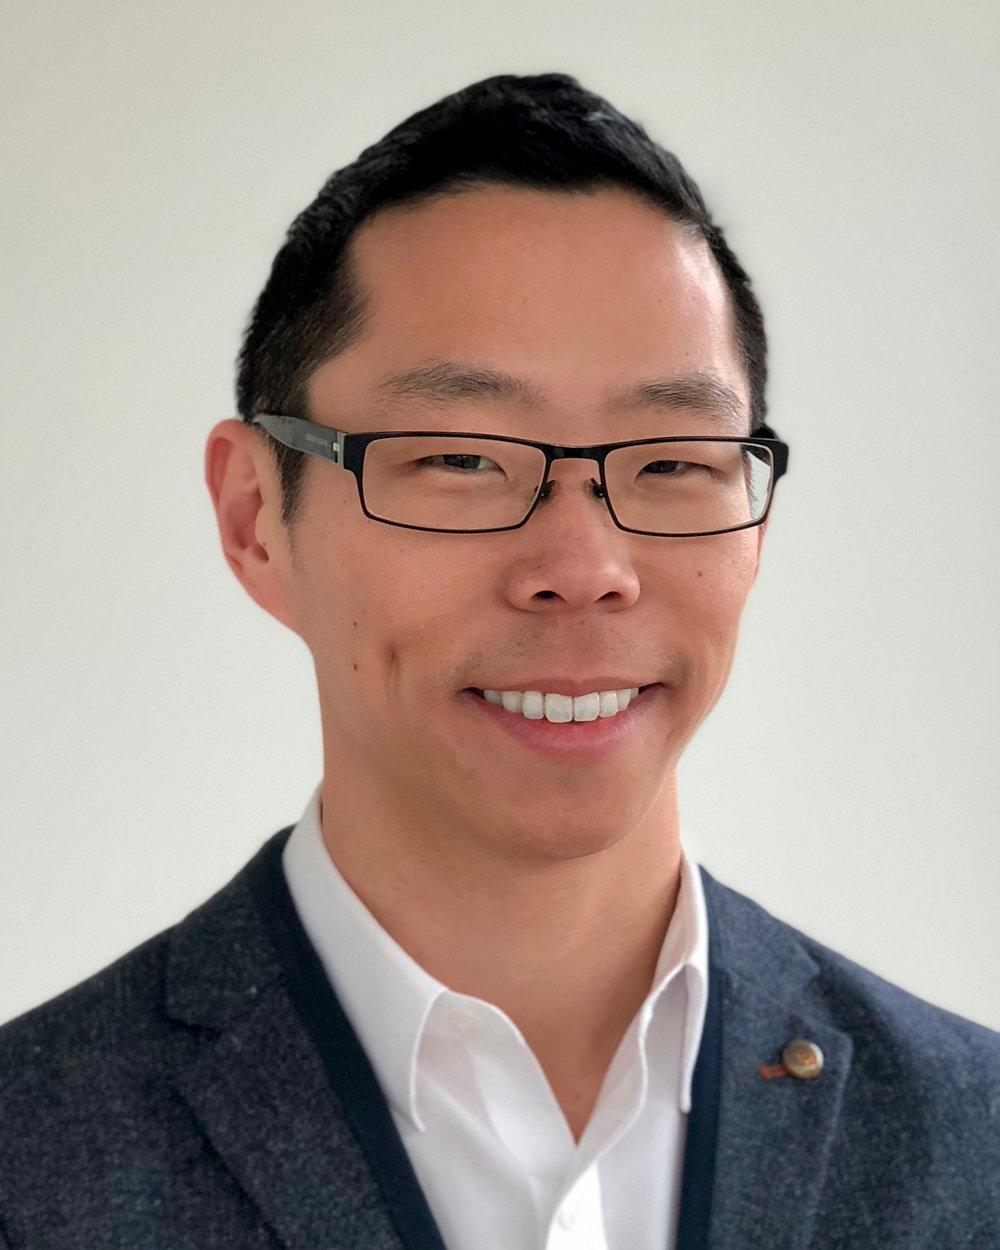 - Daniel J. Kim, MDDepartment of Emergency MedicineVancouver General HospitalDirector, Ultrasound Fellowship ProgramUniversity of British Columbia@dan___kim